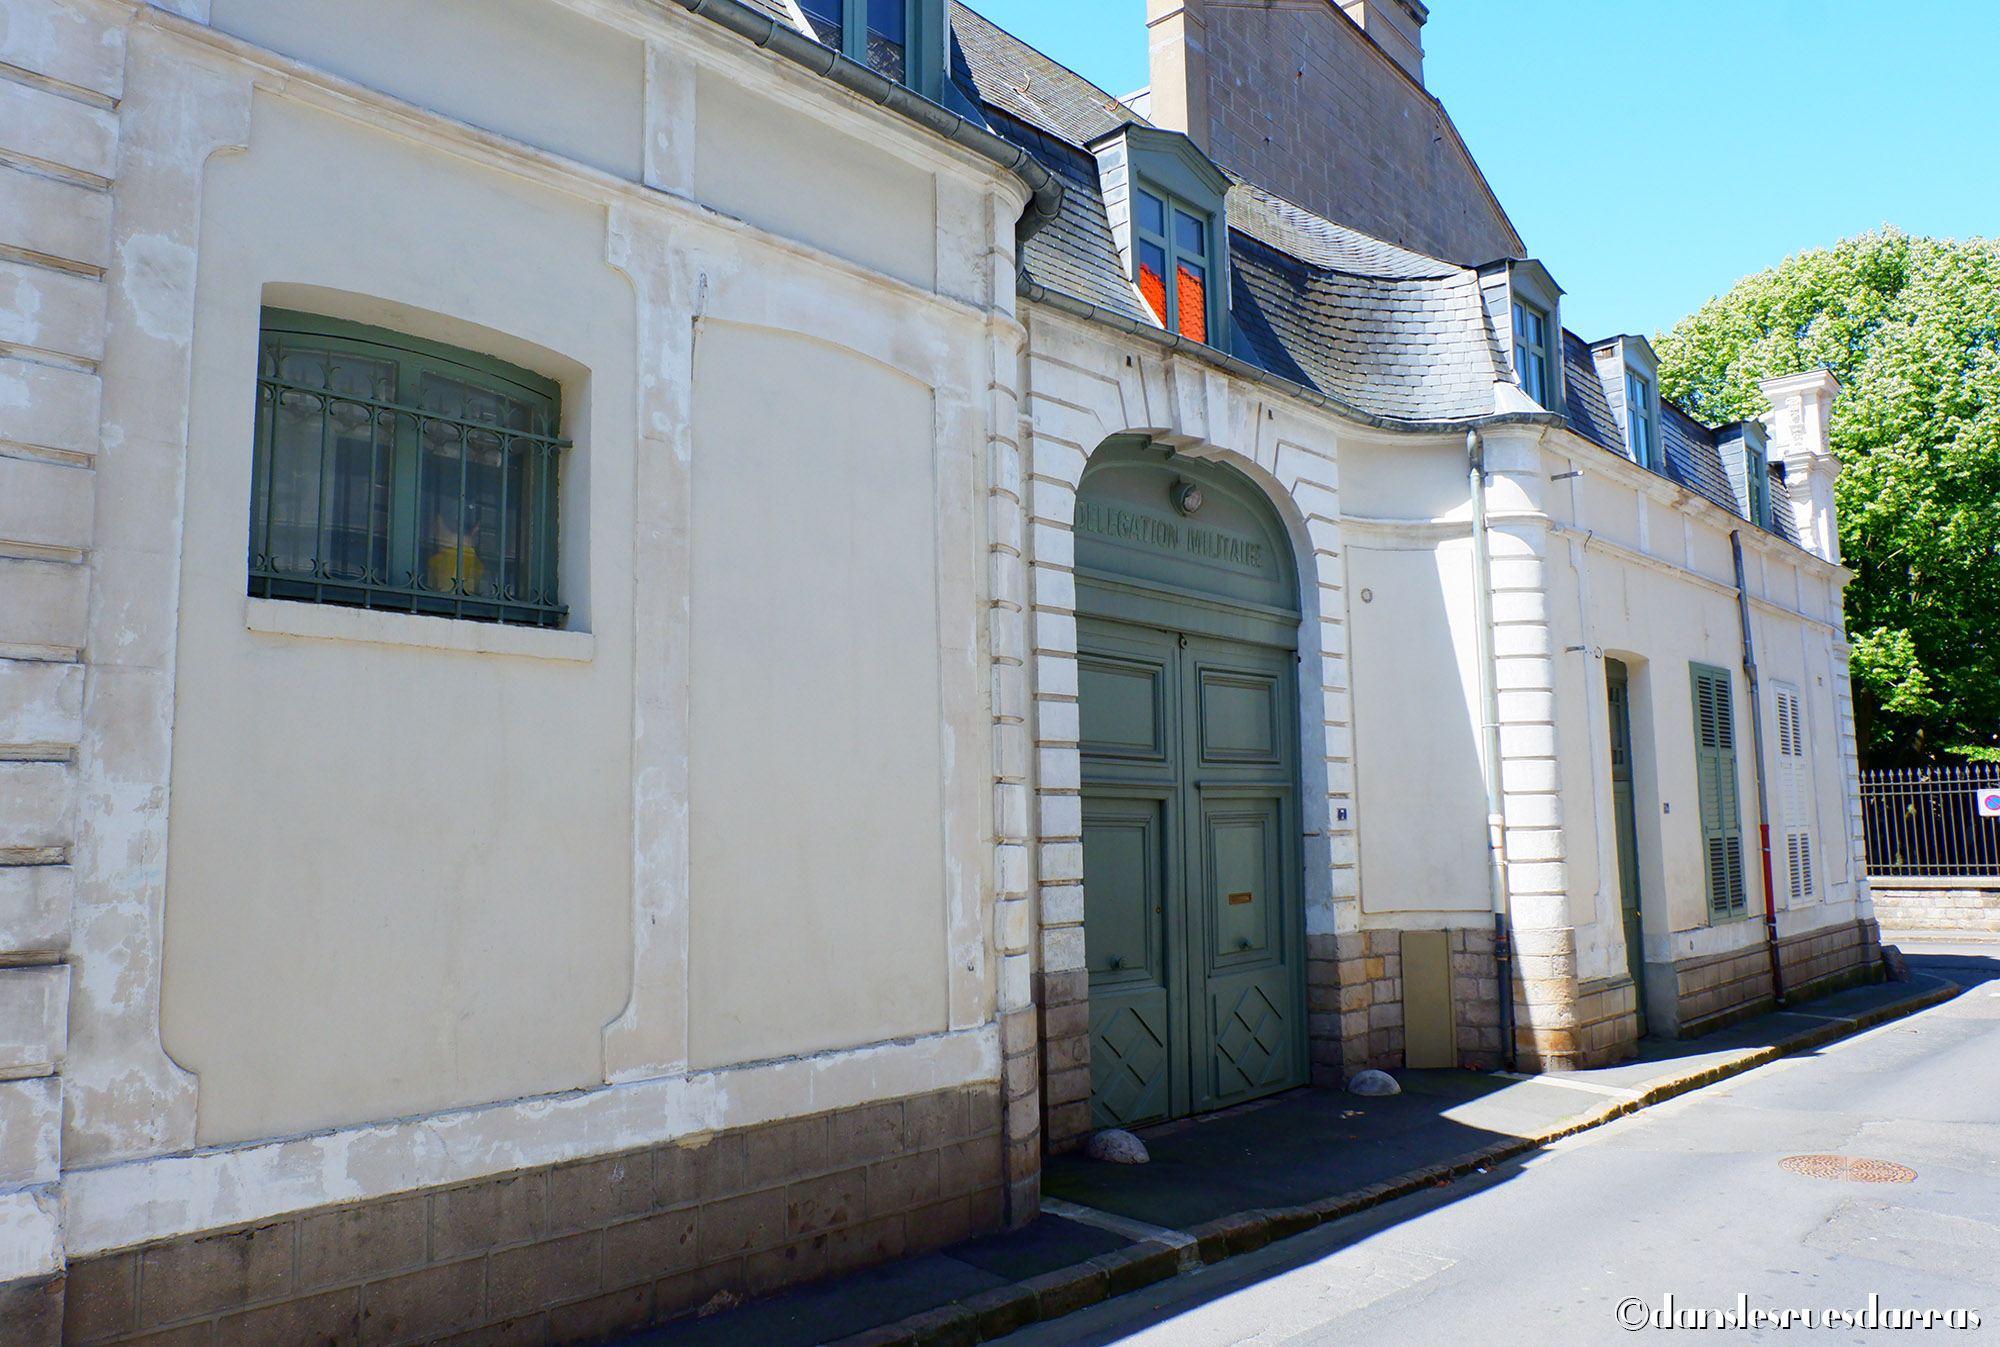 Hôtel de Lannoy - 7 rue Ernest de Lannoy - Arras (©MD - danslesruesdarras)